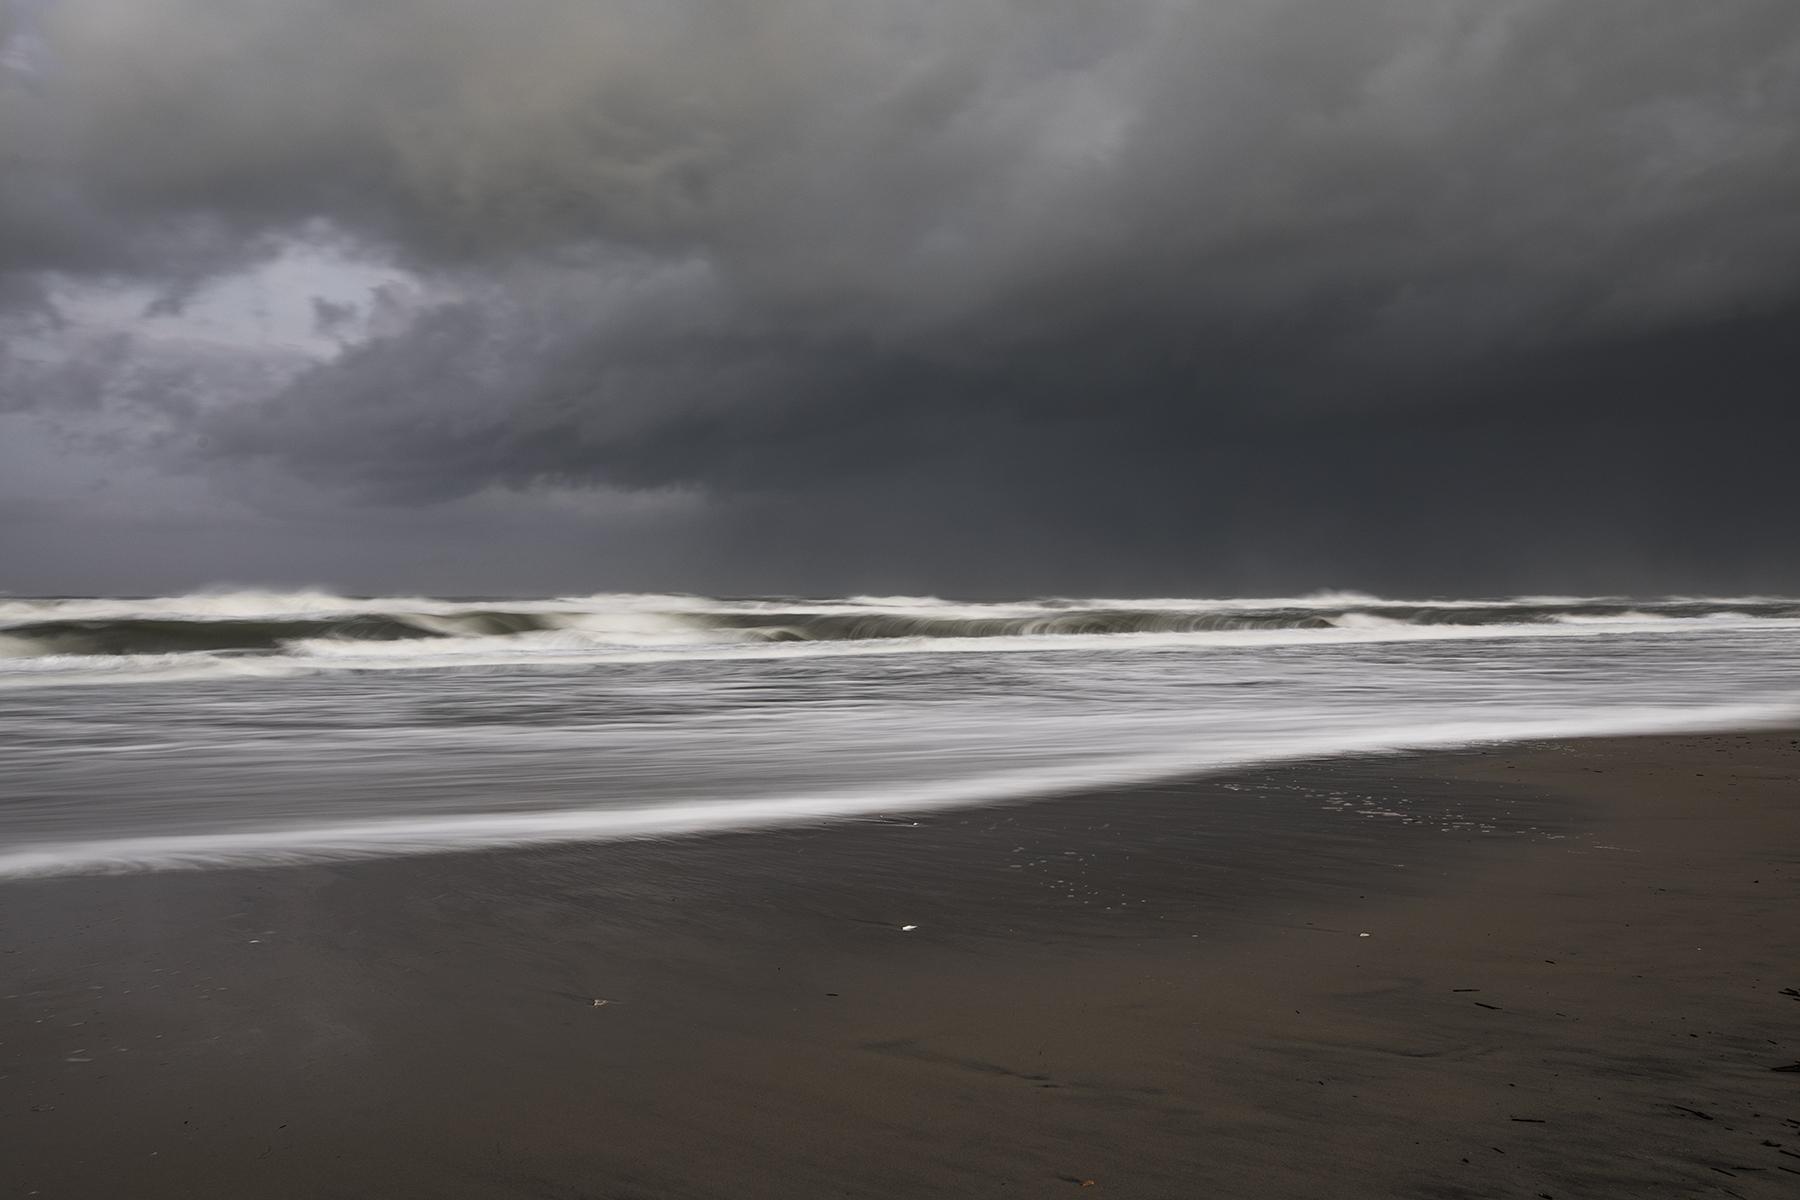 An angry ocean.